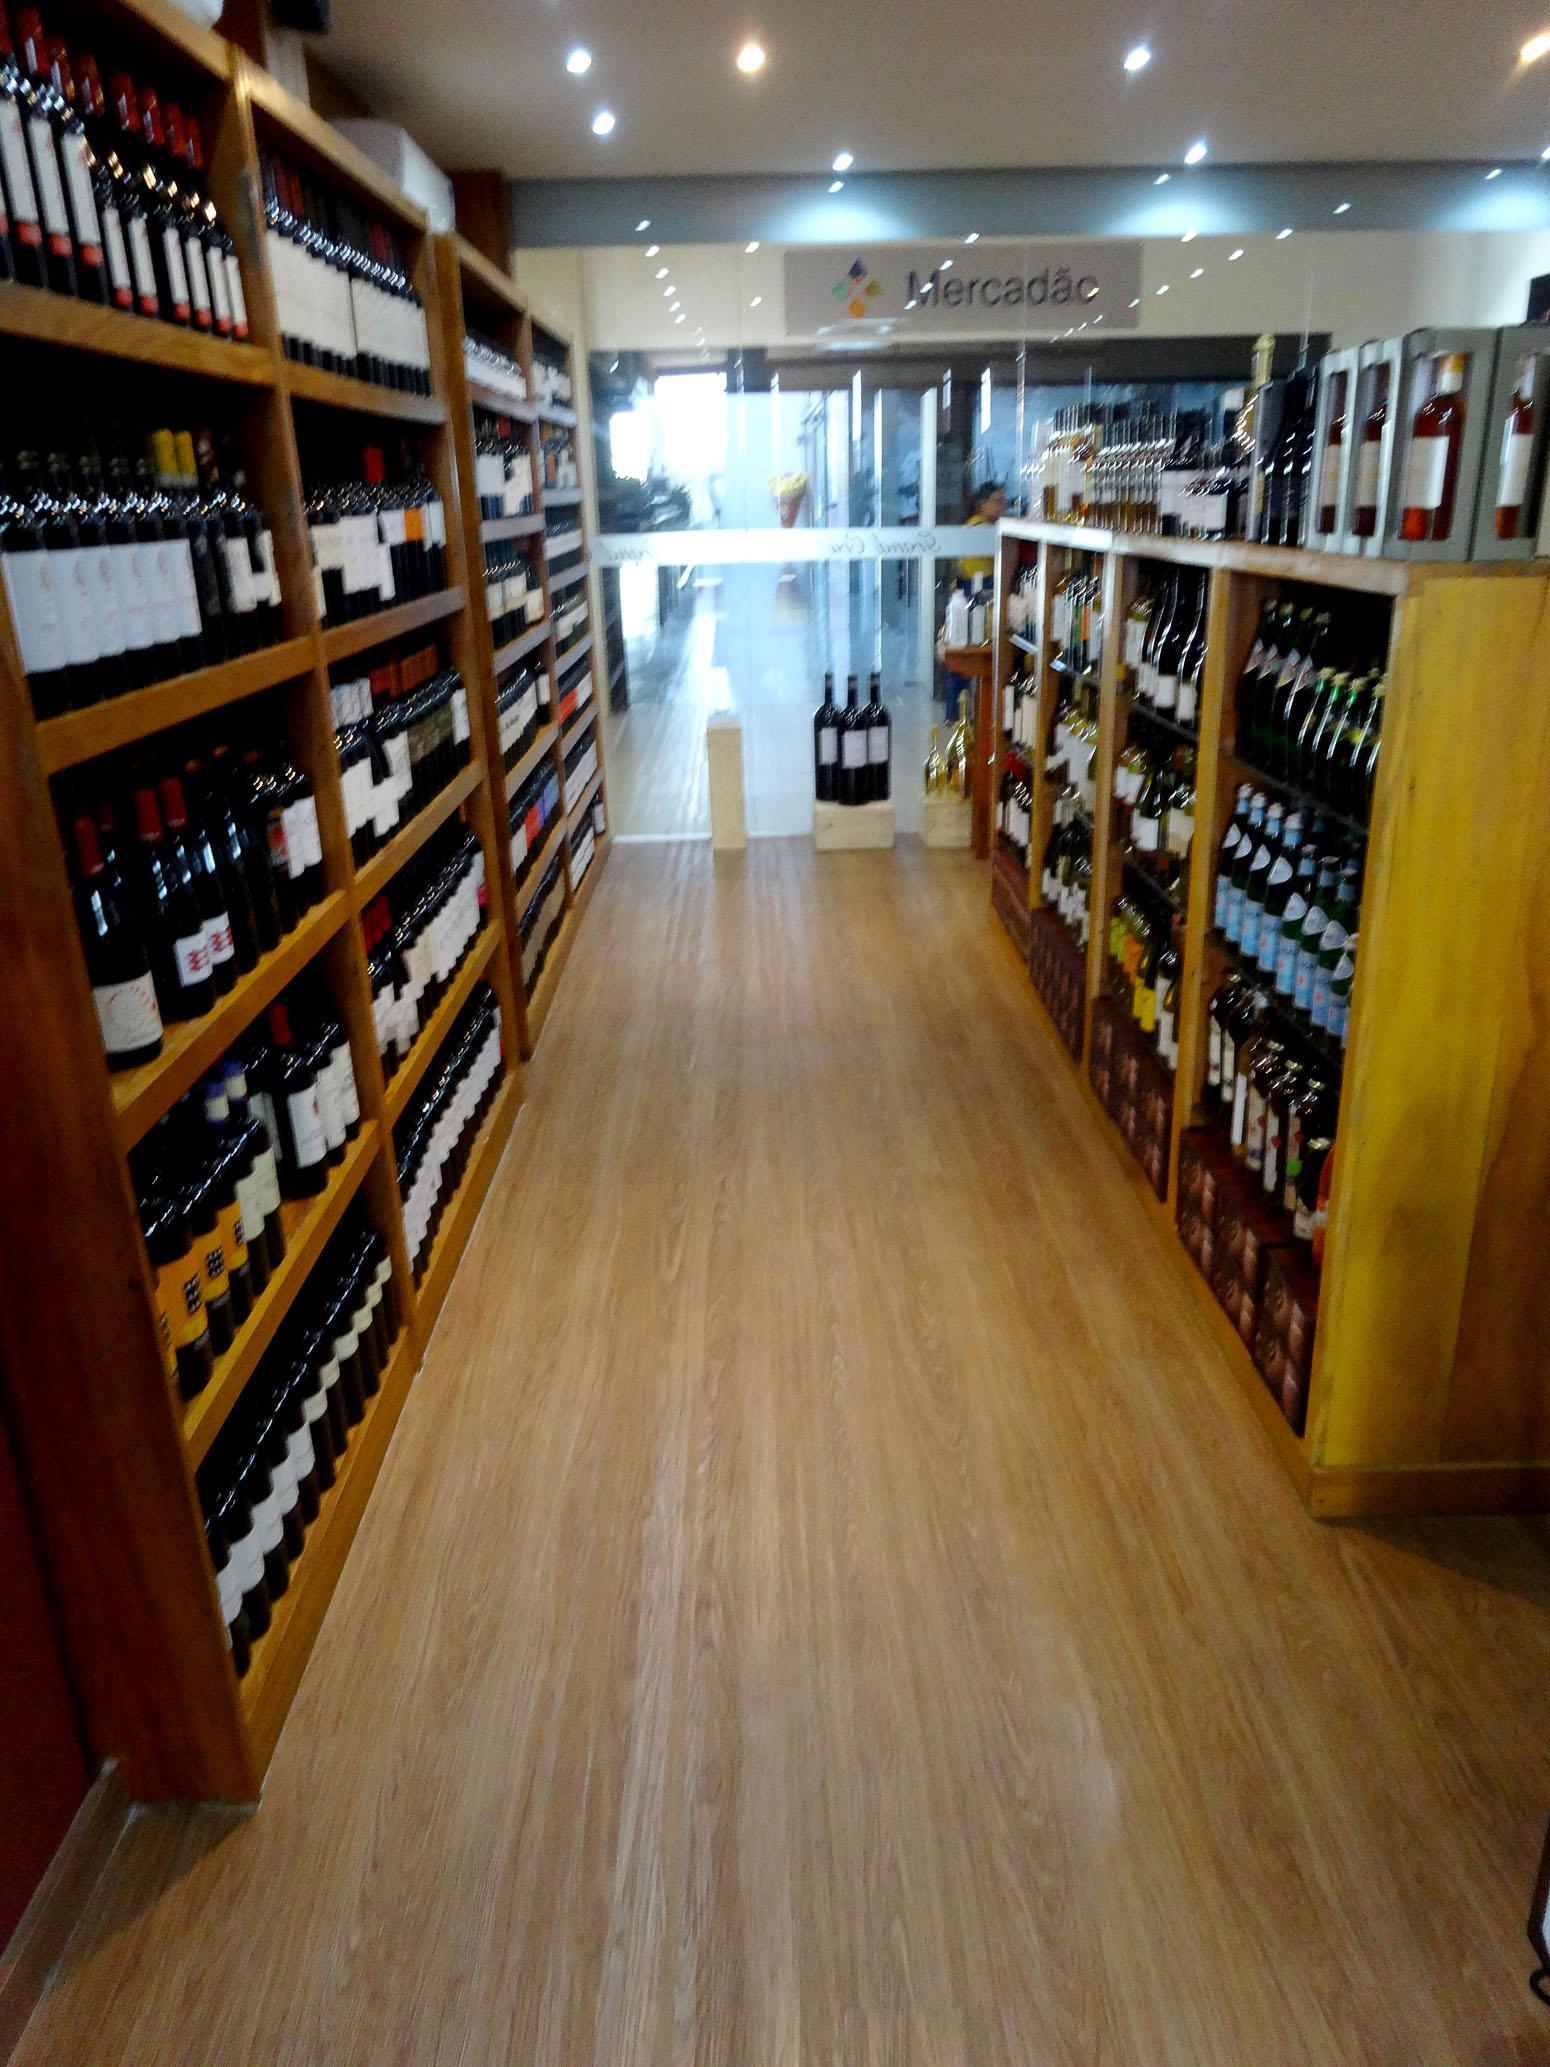 Piso vinílico rústico decora loja de vinhos